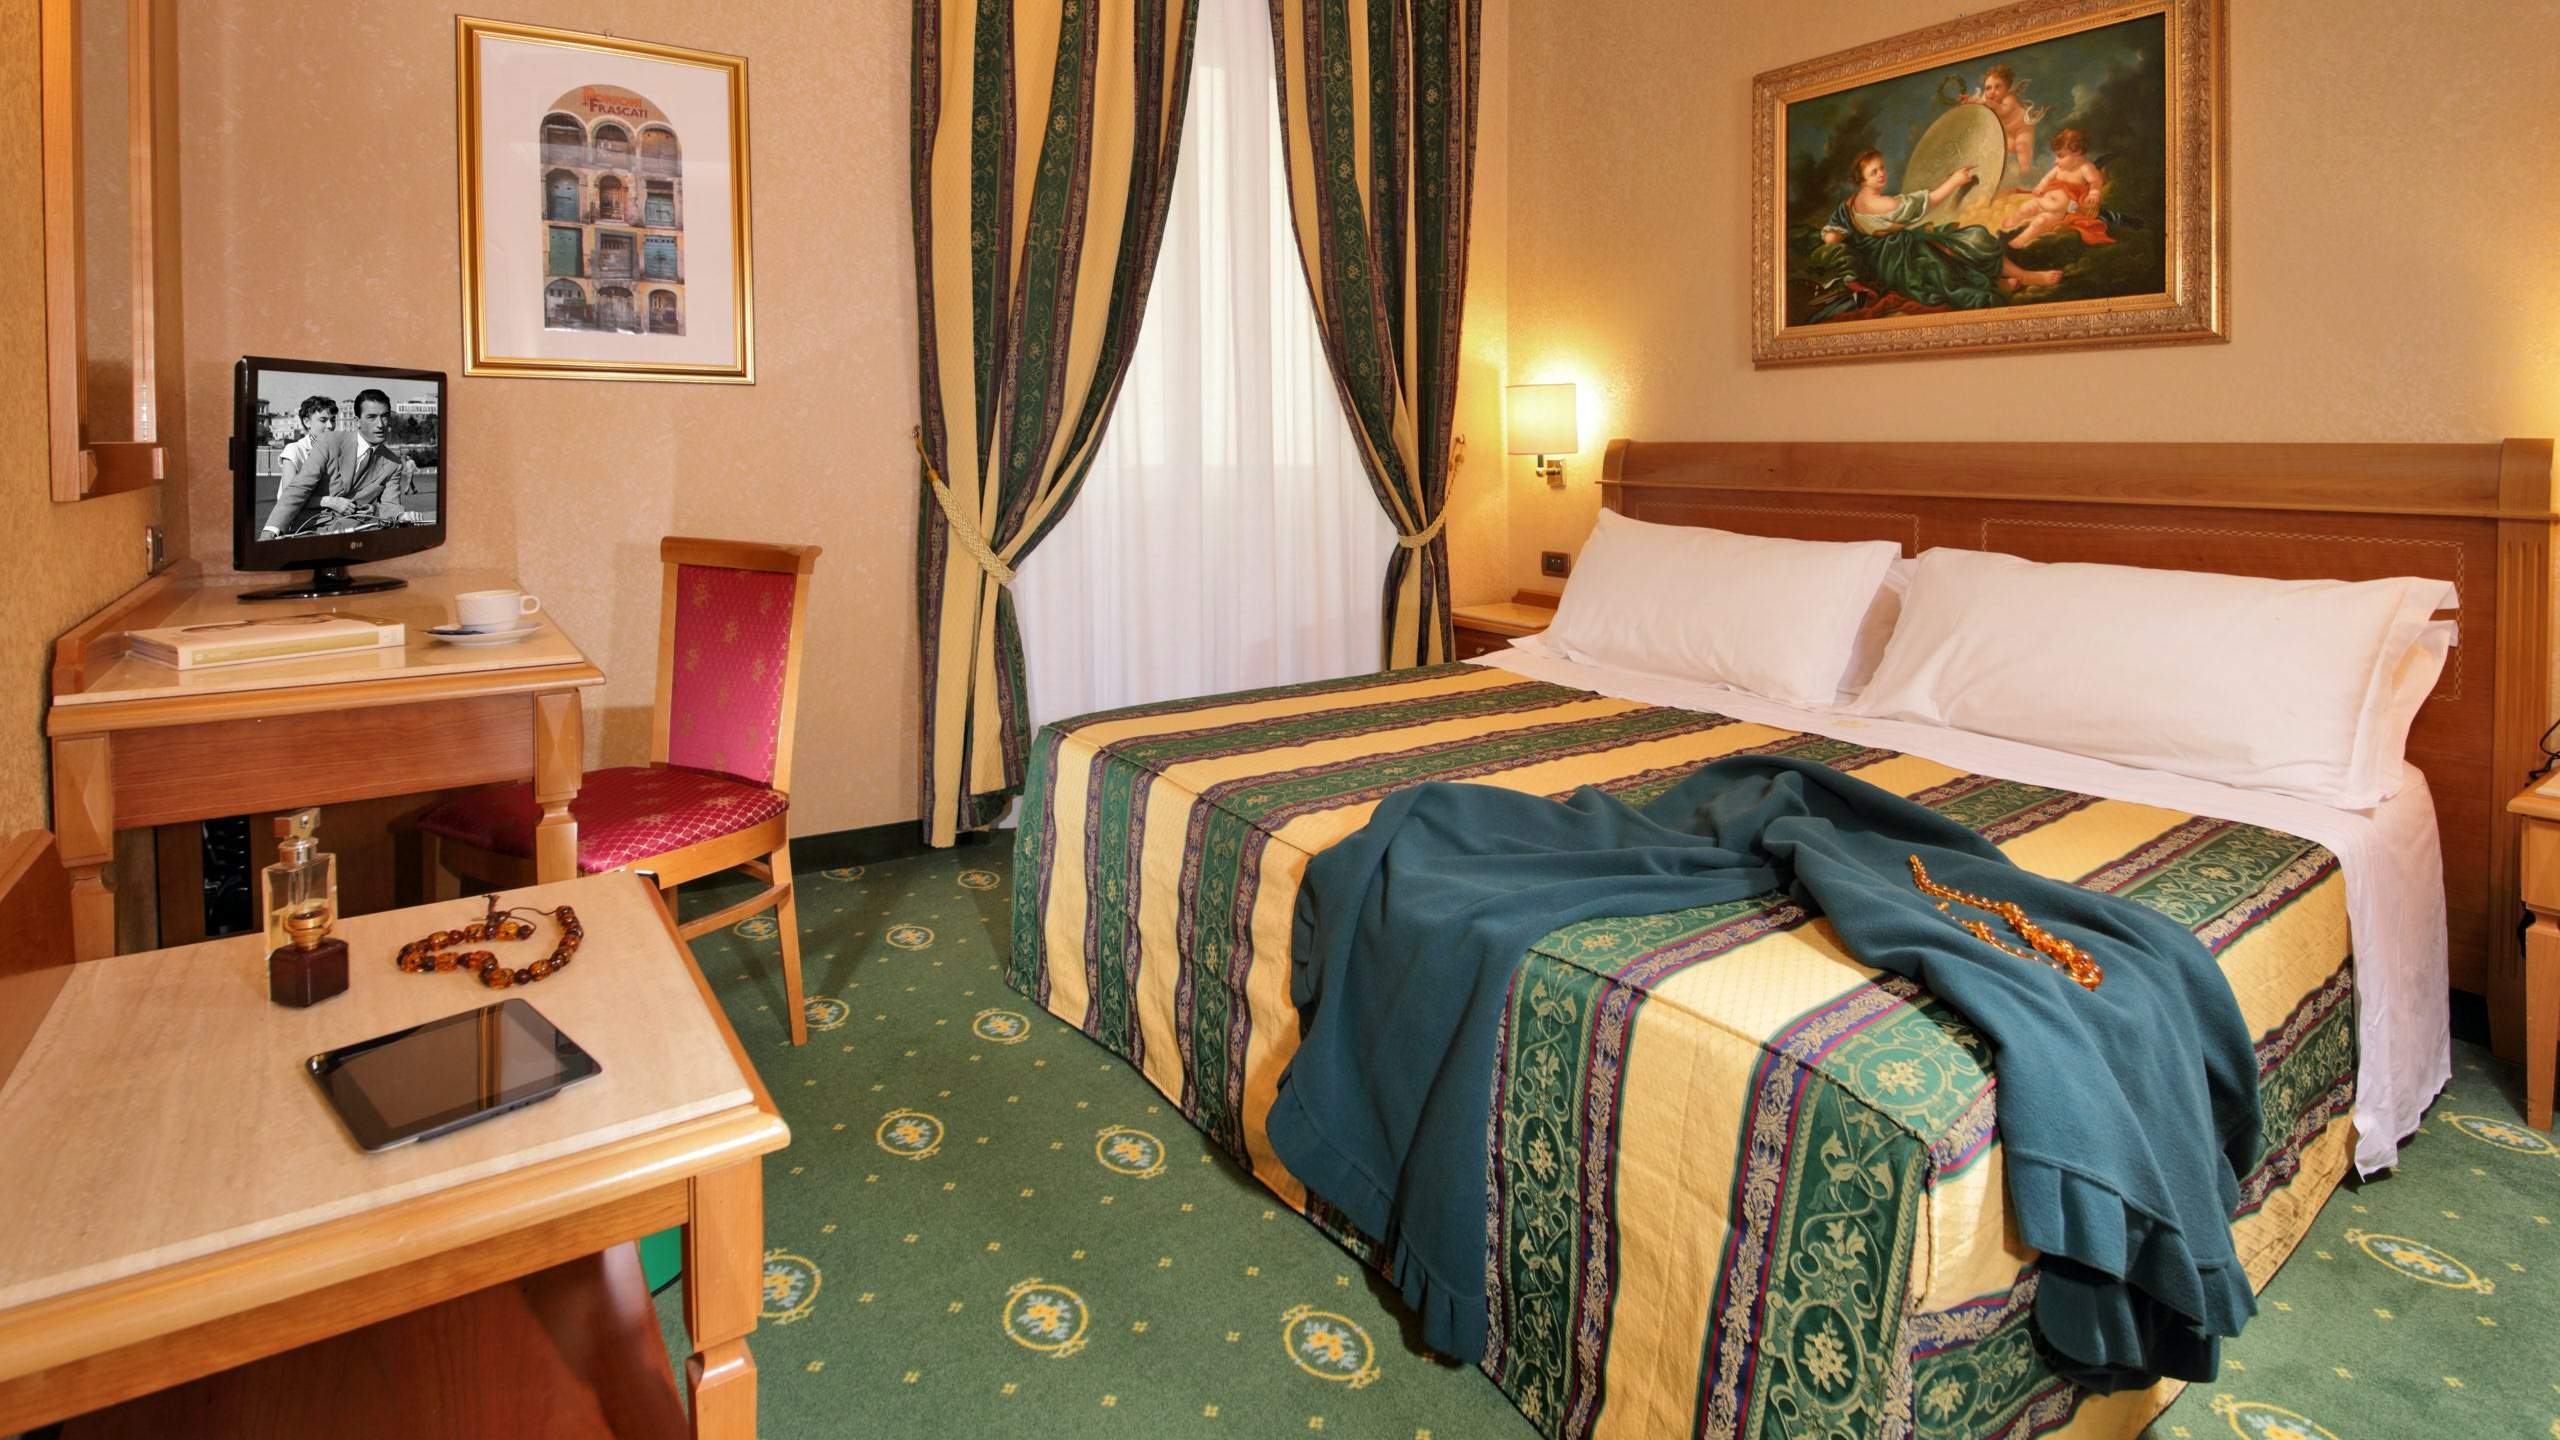 Hotel-Colonna-Frascati-camera-10